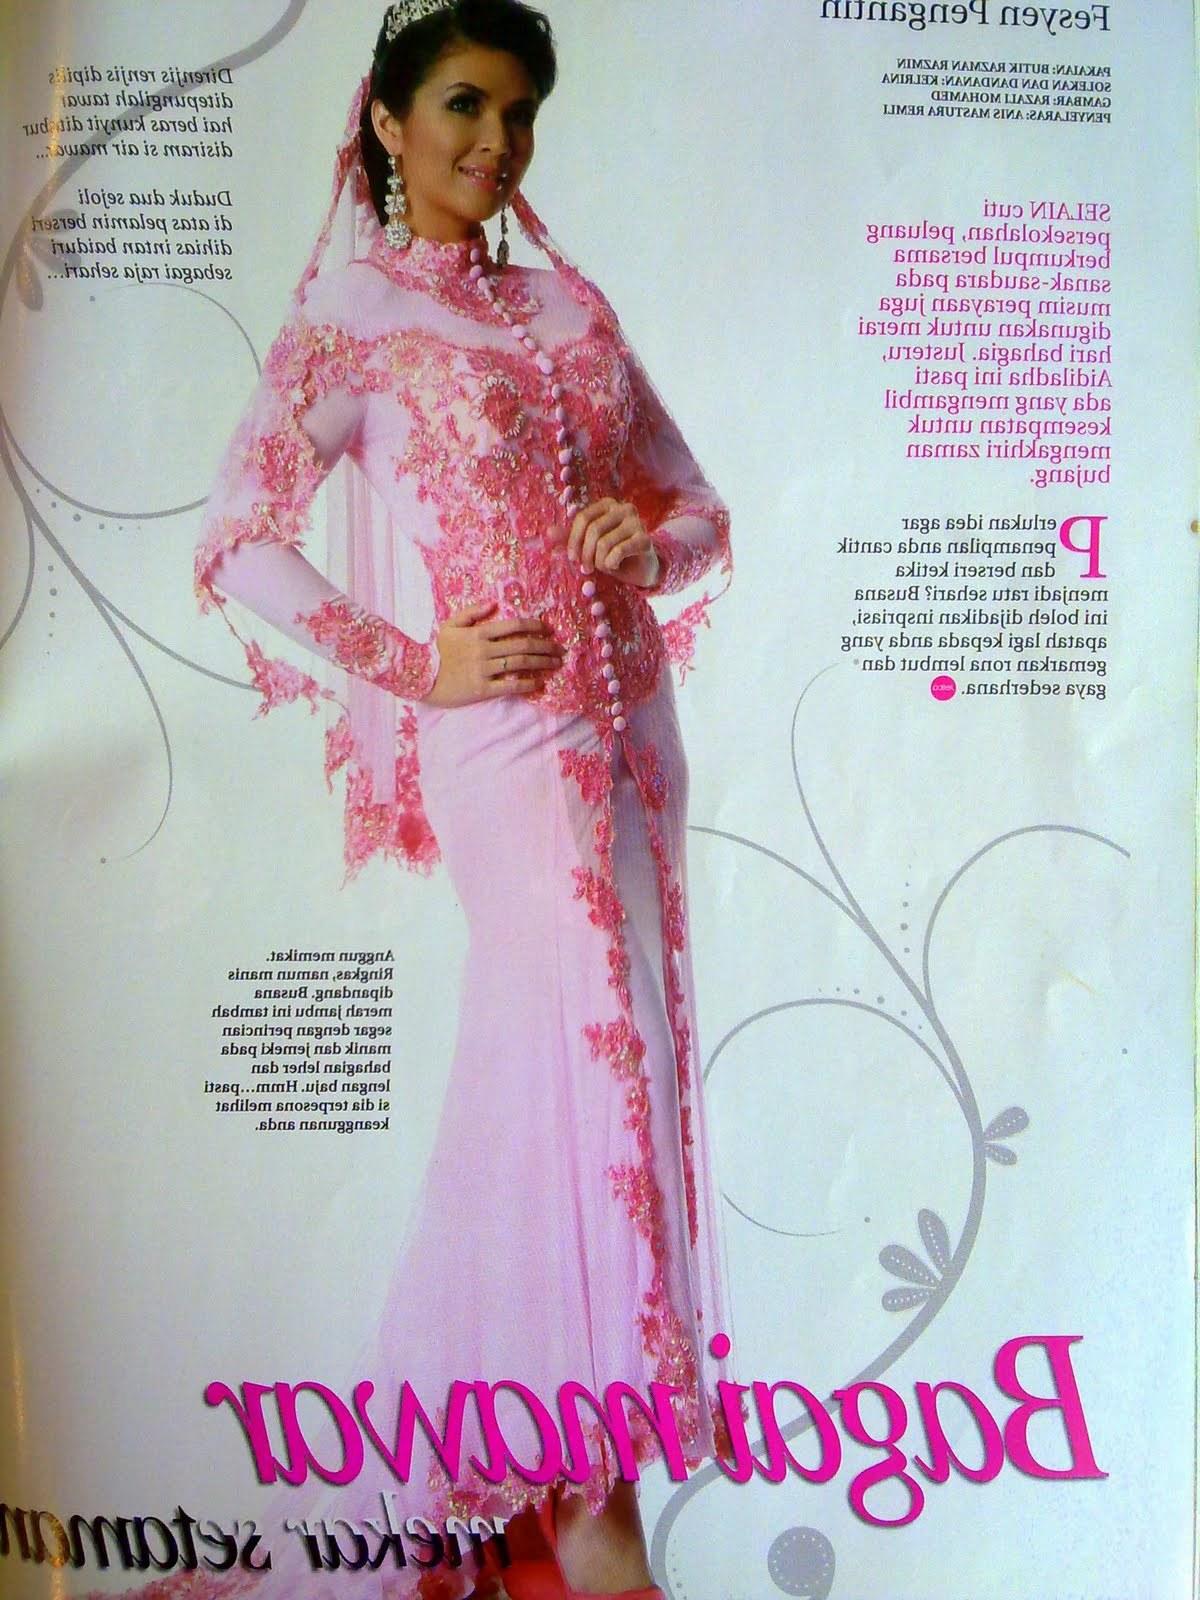 Design Gambar Baju Pengantin Muslim Irdz Wynn Nasution 2010